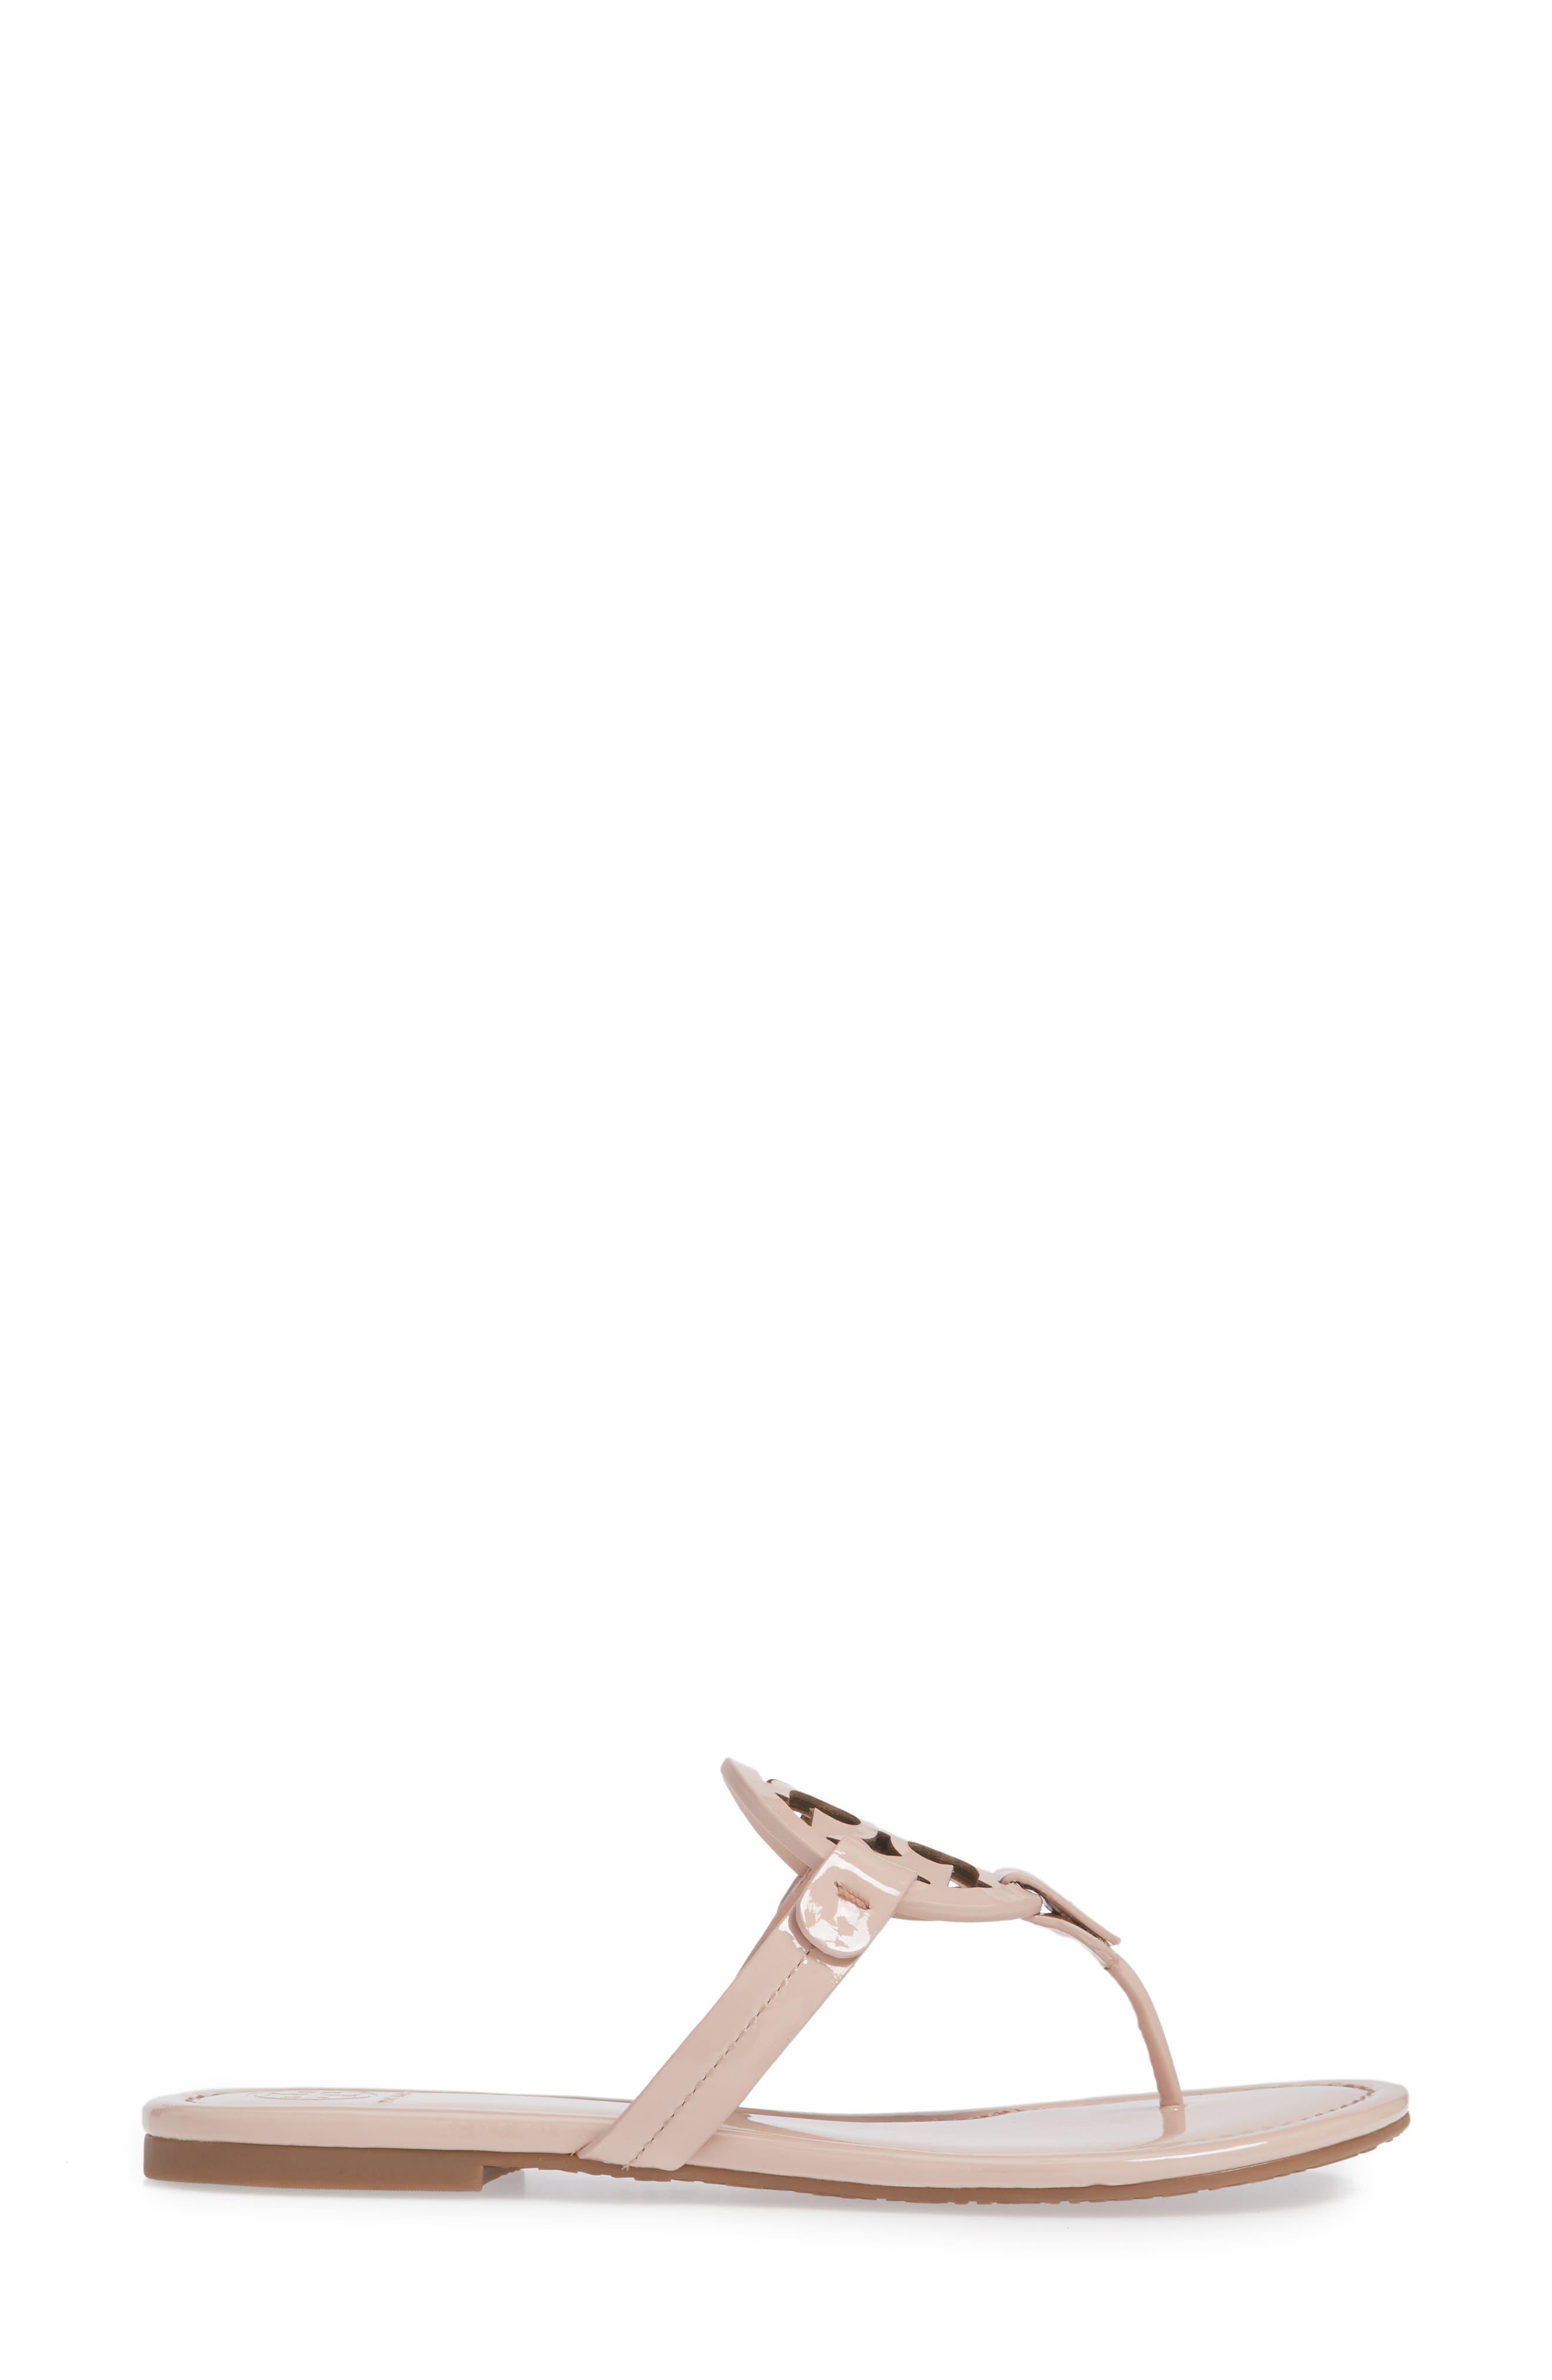 'Miller' Flip Flop,                             Alternate thumbnail 174, color,